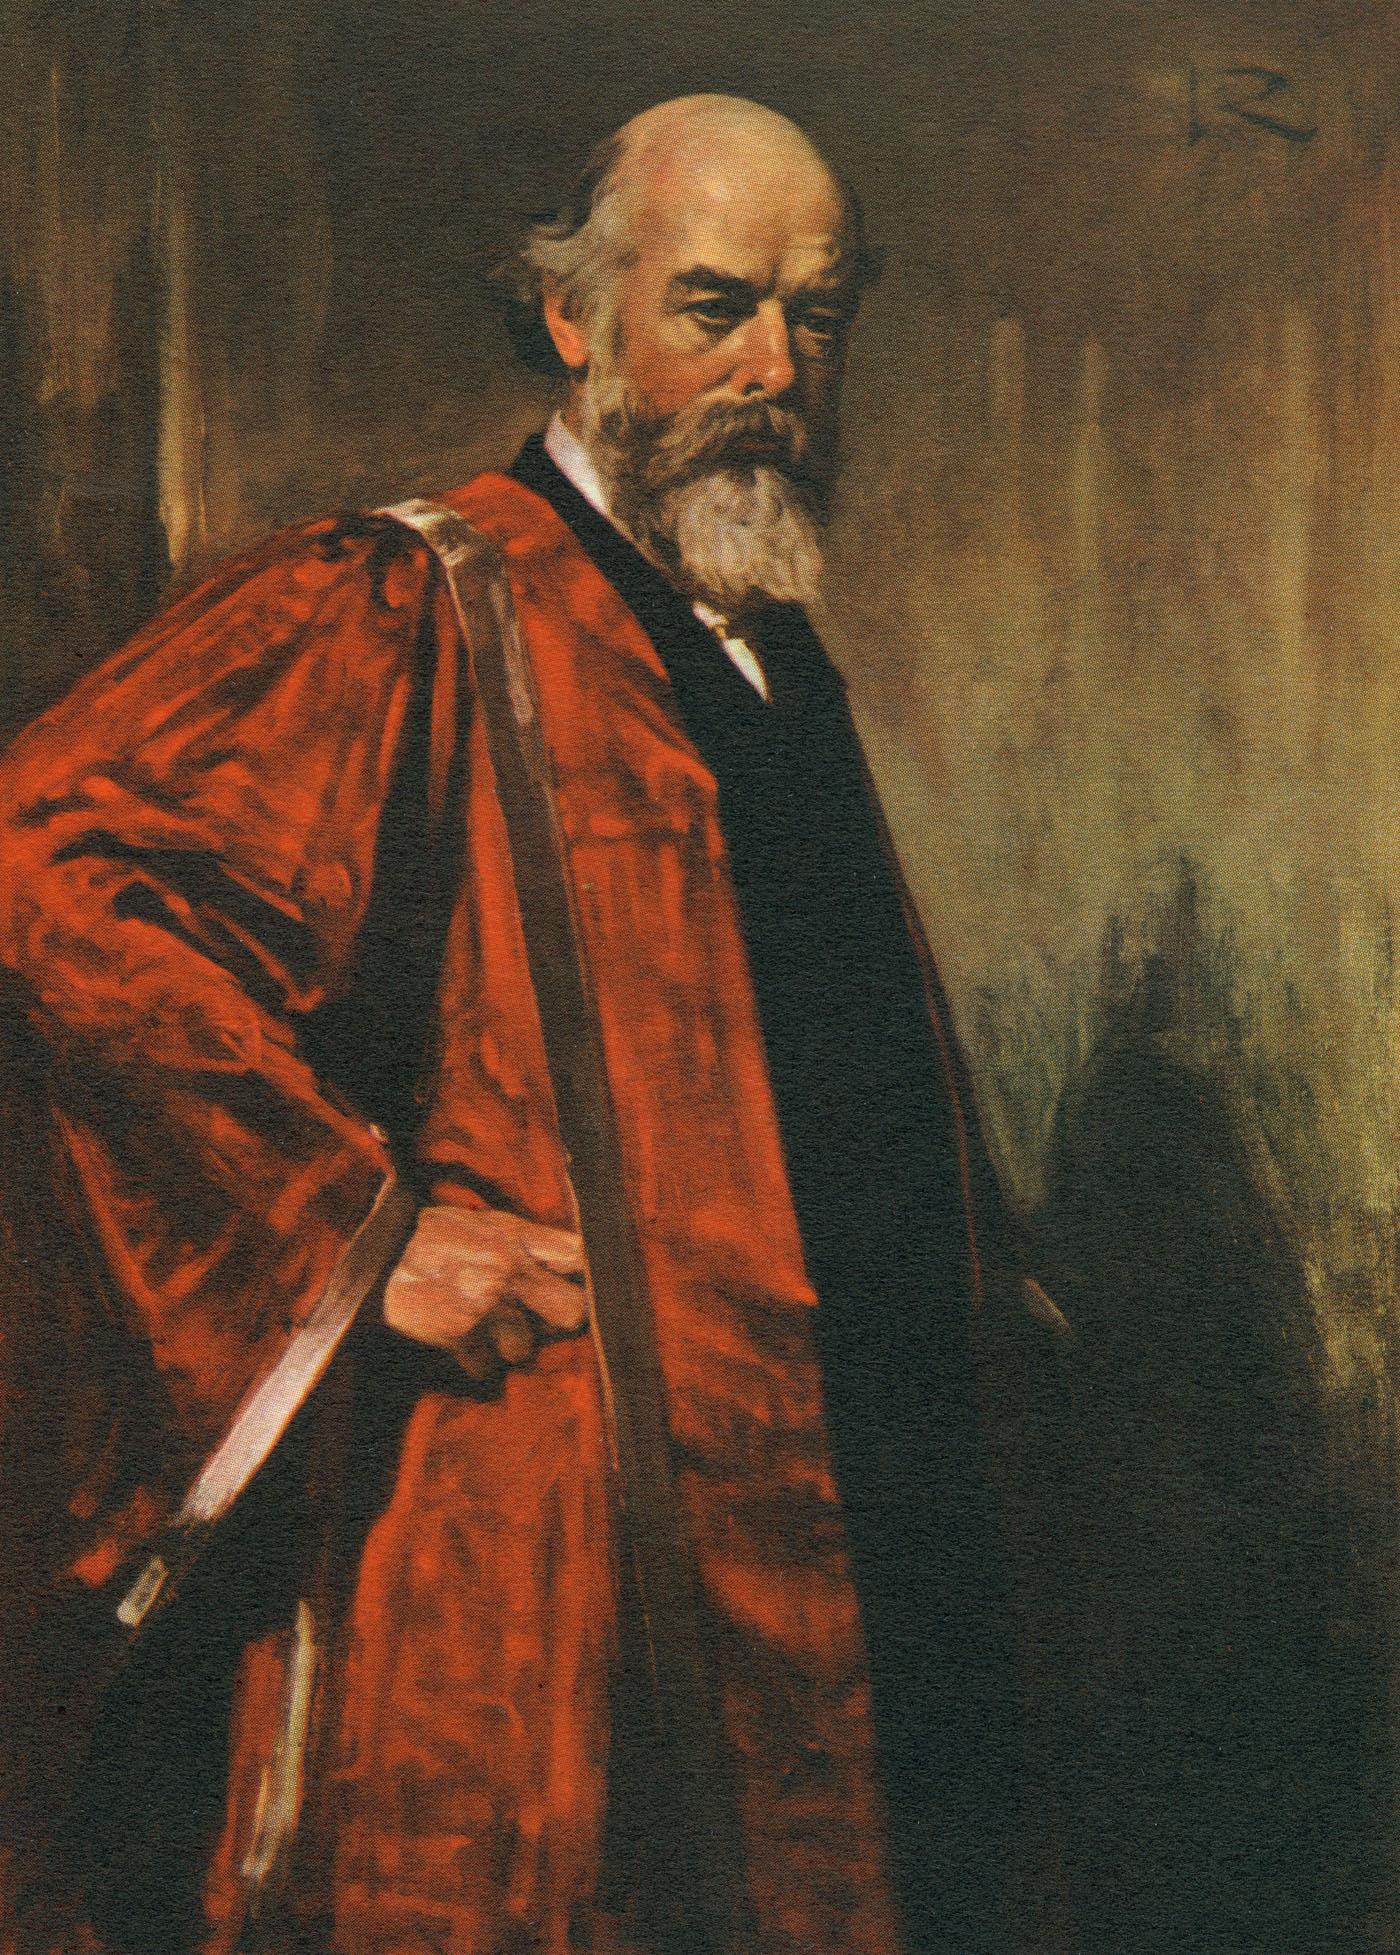 Sir Oliver Lodge